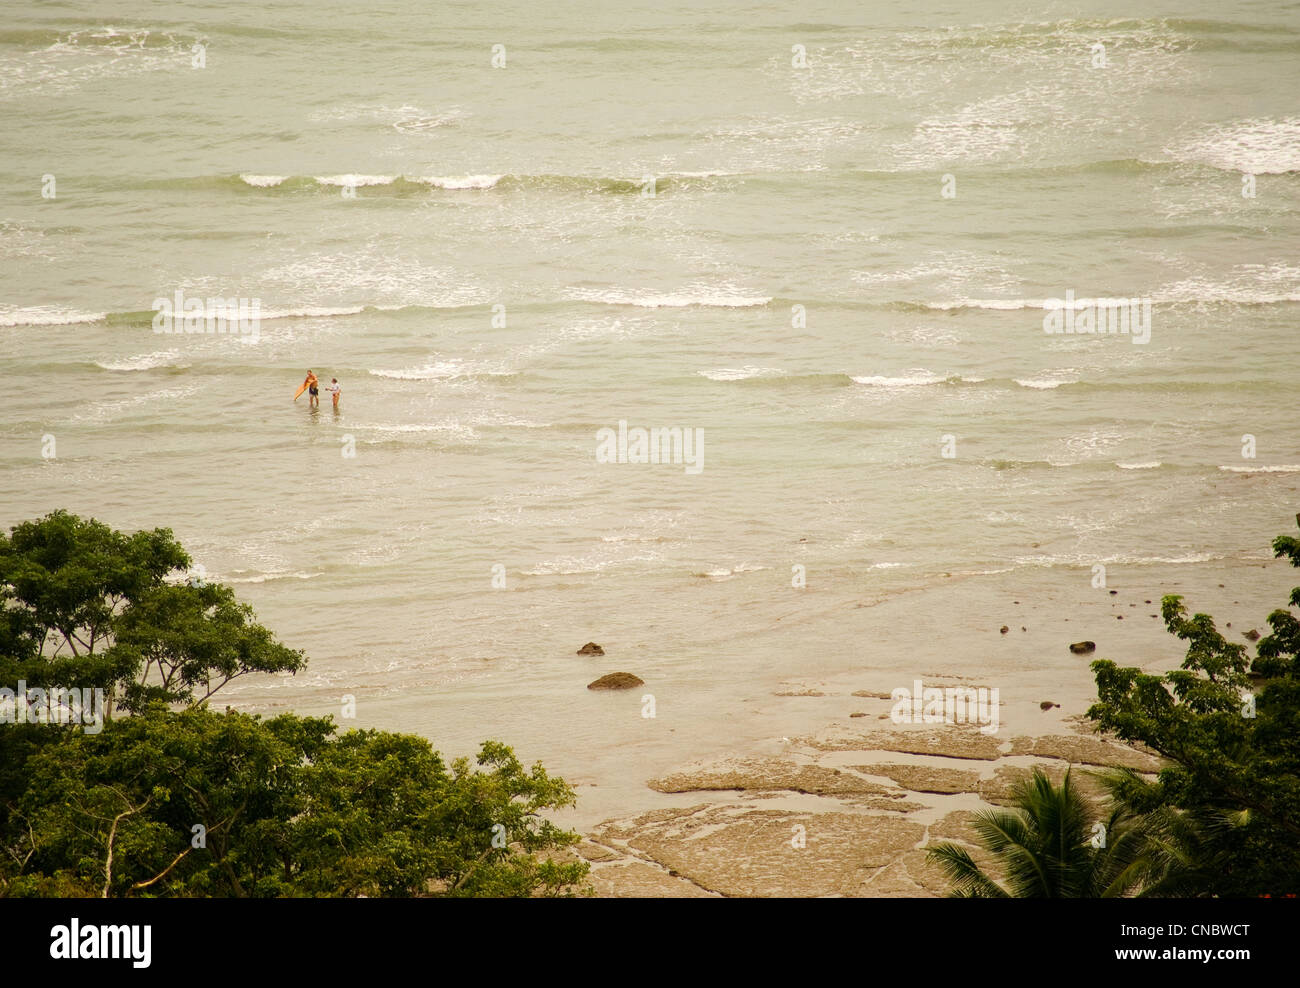 Pacific coast of costa rica on the osa peninsula - Stock Image